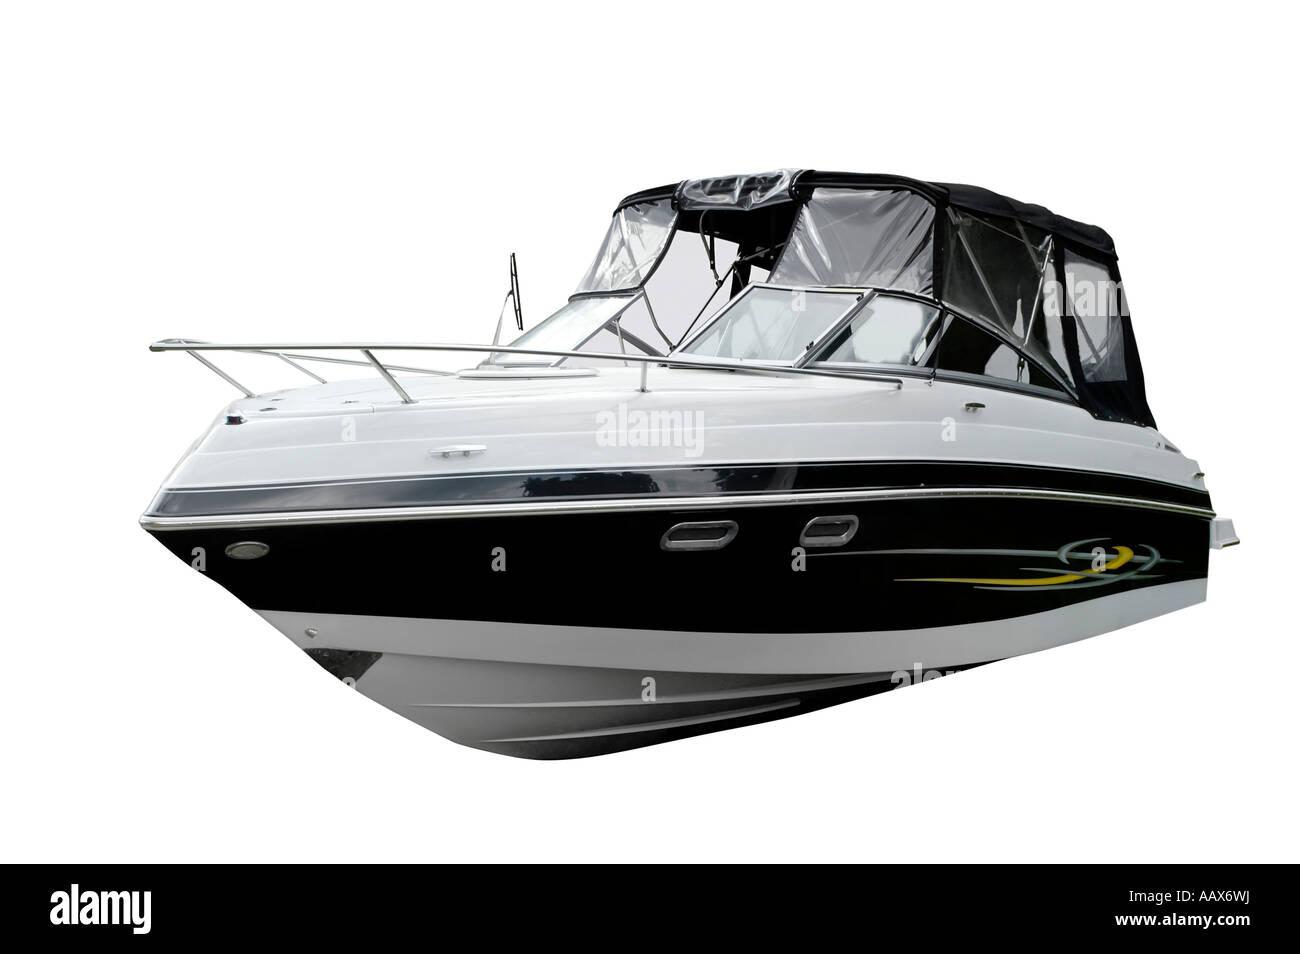 Pleasure boat - Stock Image